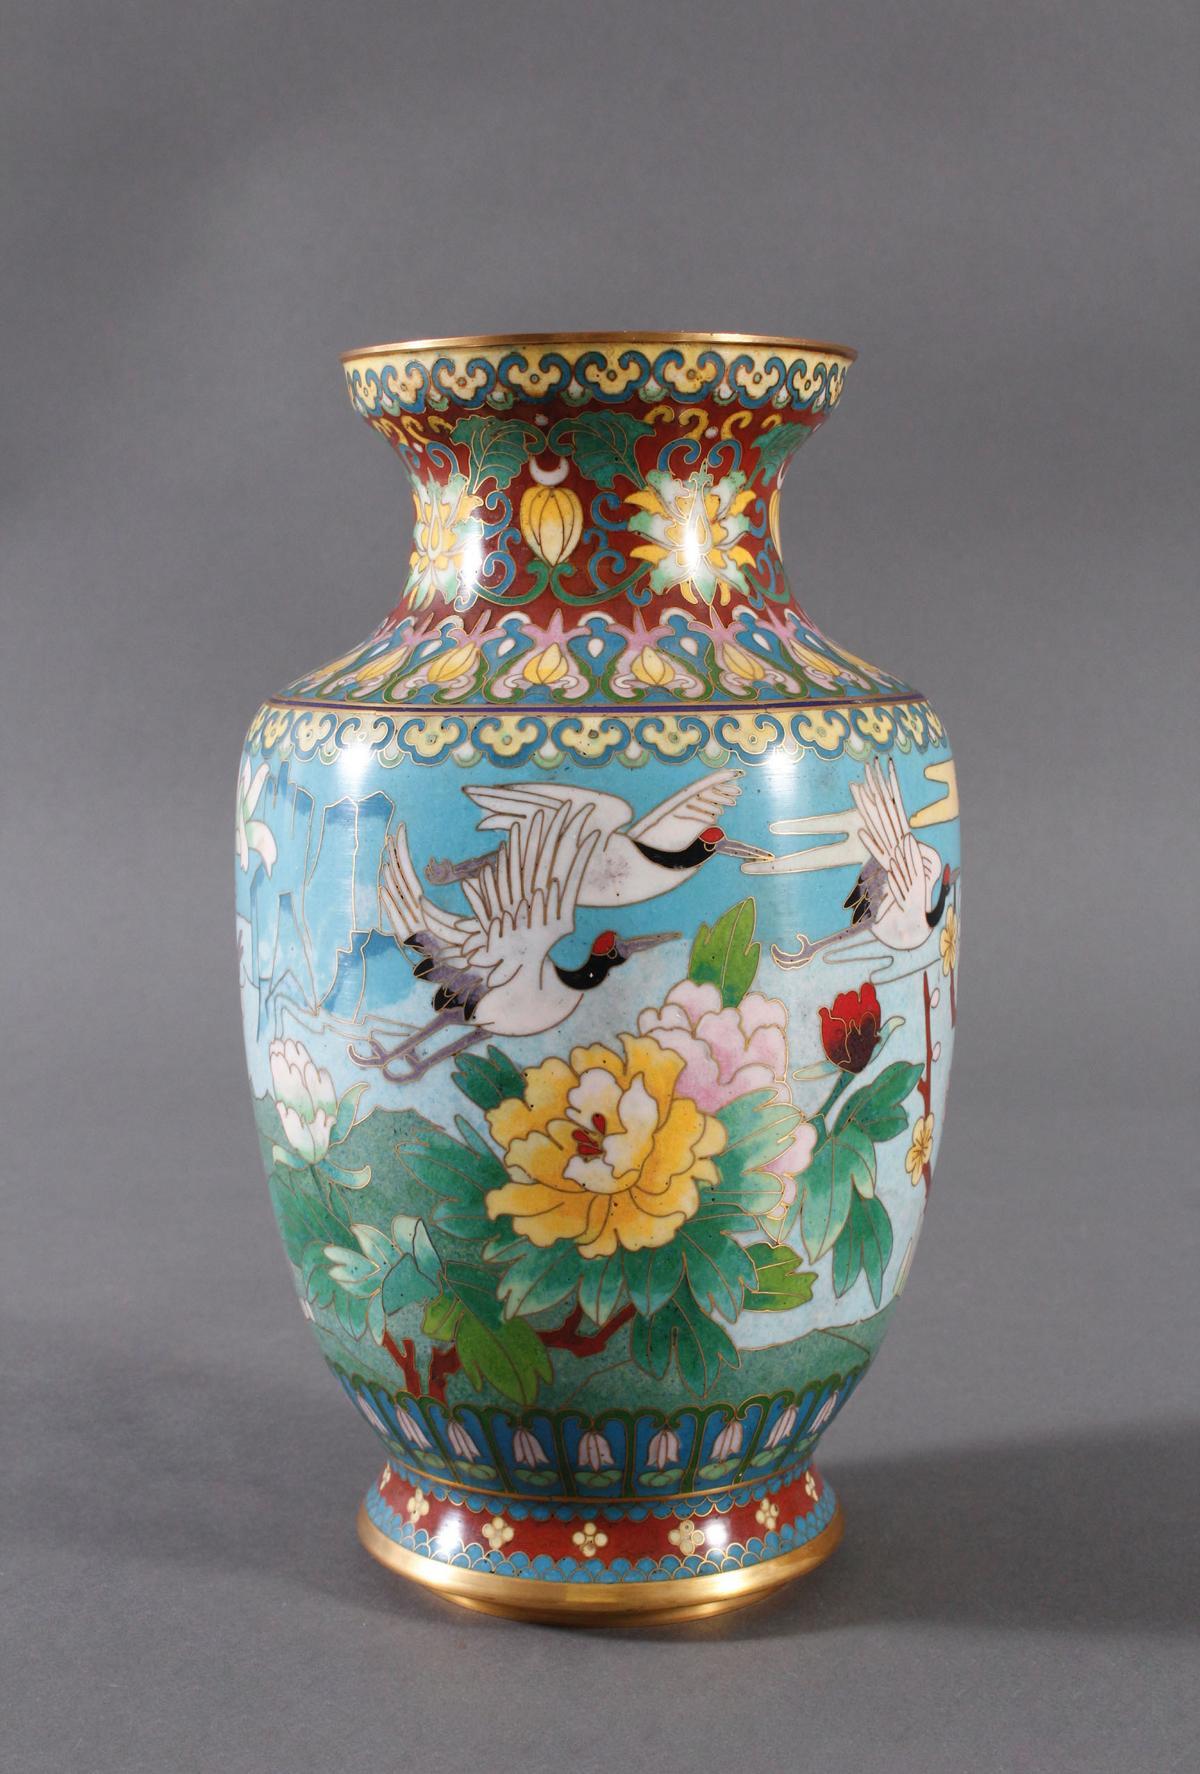 Cloisonne Vase, China, 1. Hälfte 20. Jahrhundert